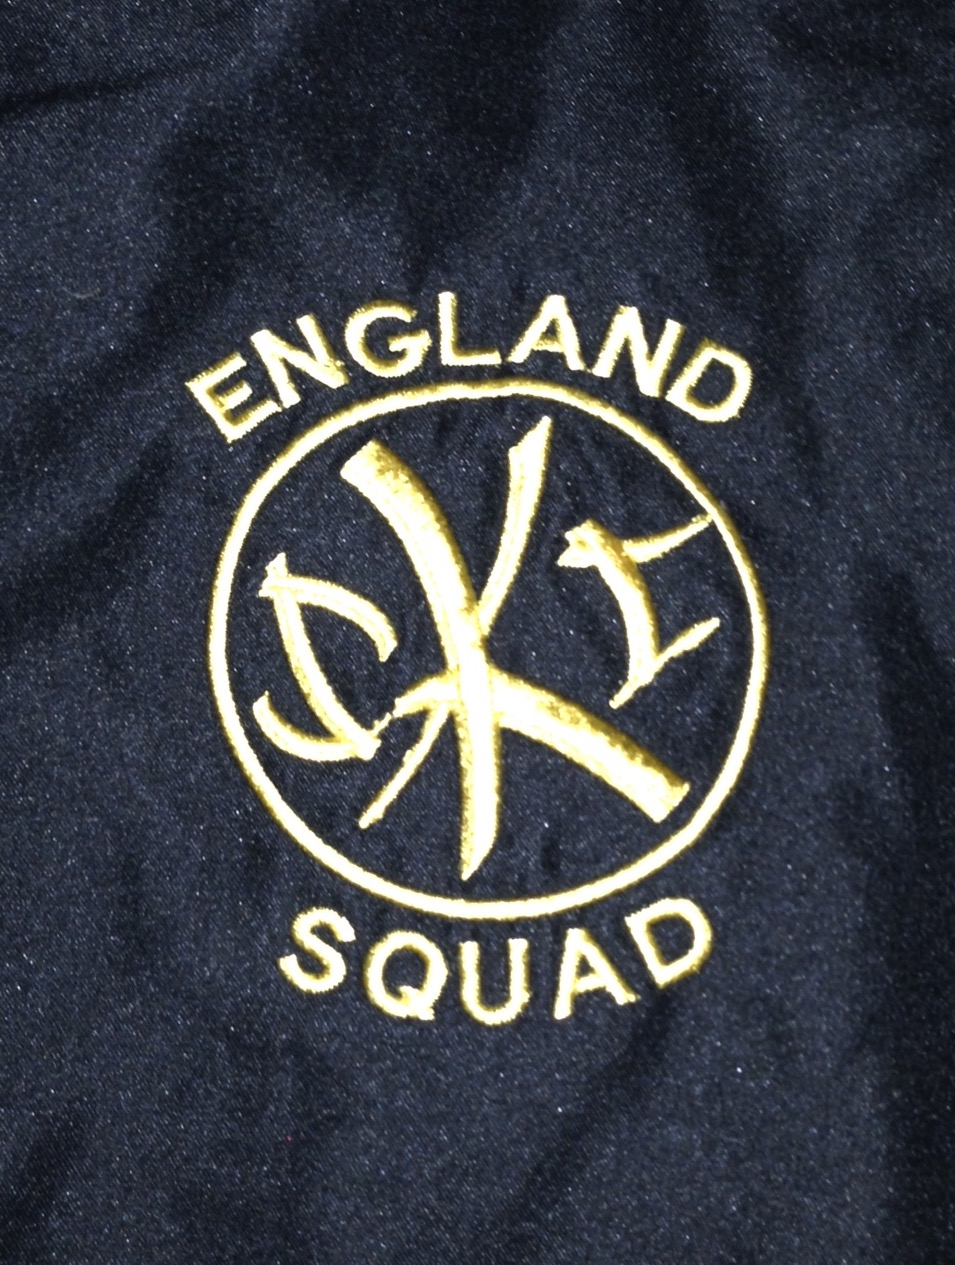 SKCE Squad